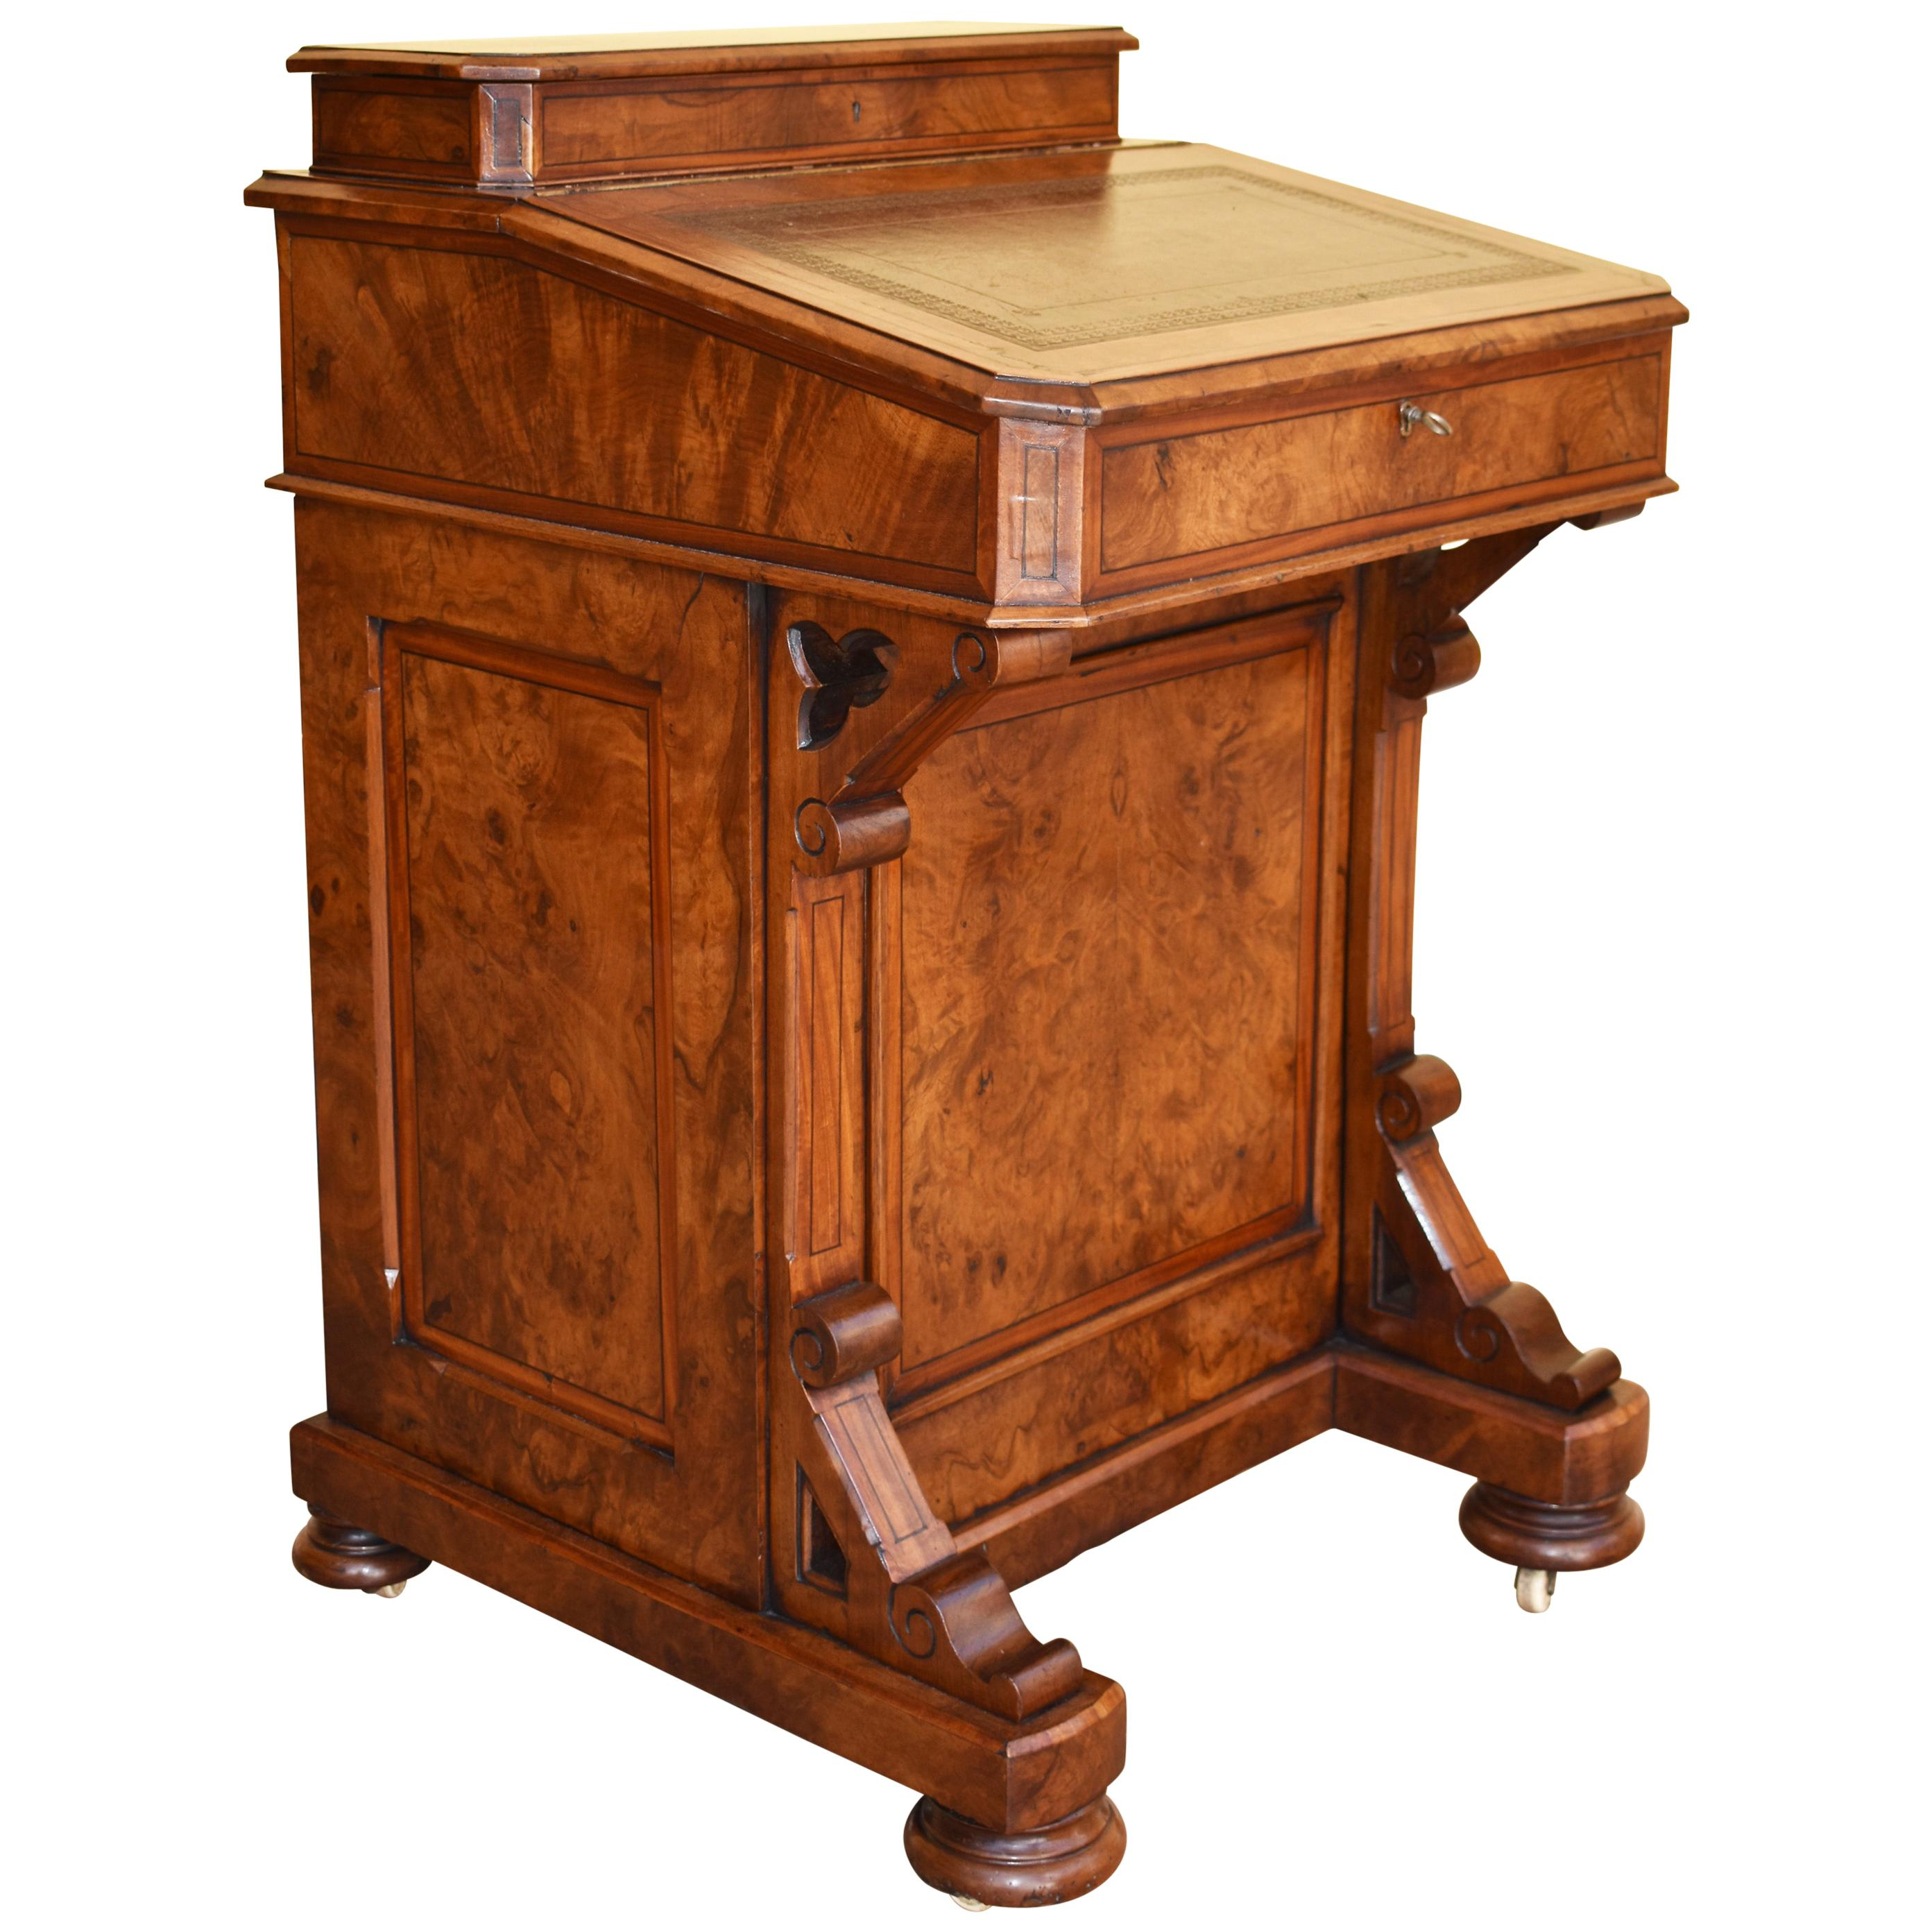 19th Century English Victorian Burr Walnut Davenport